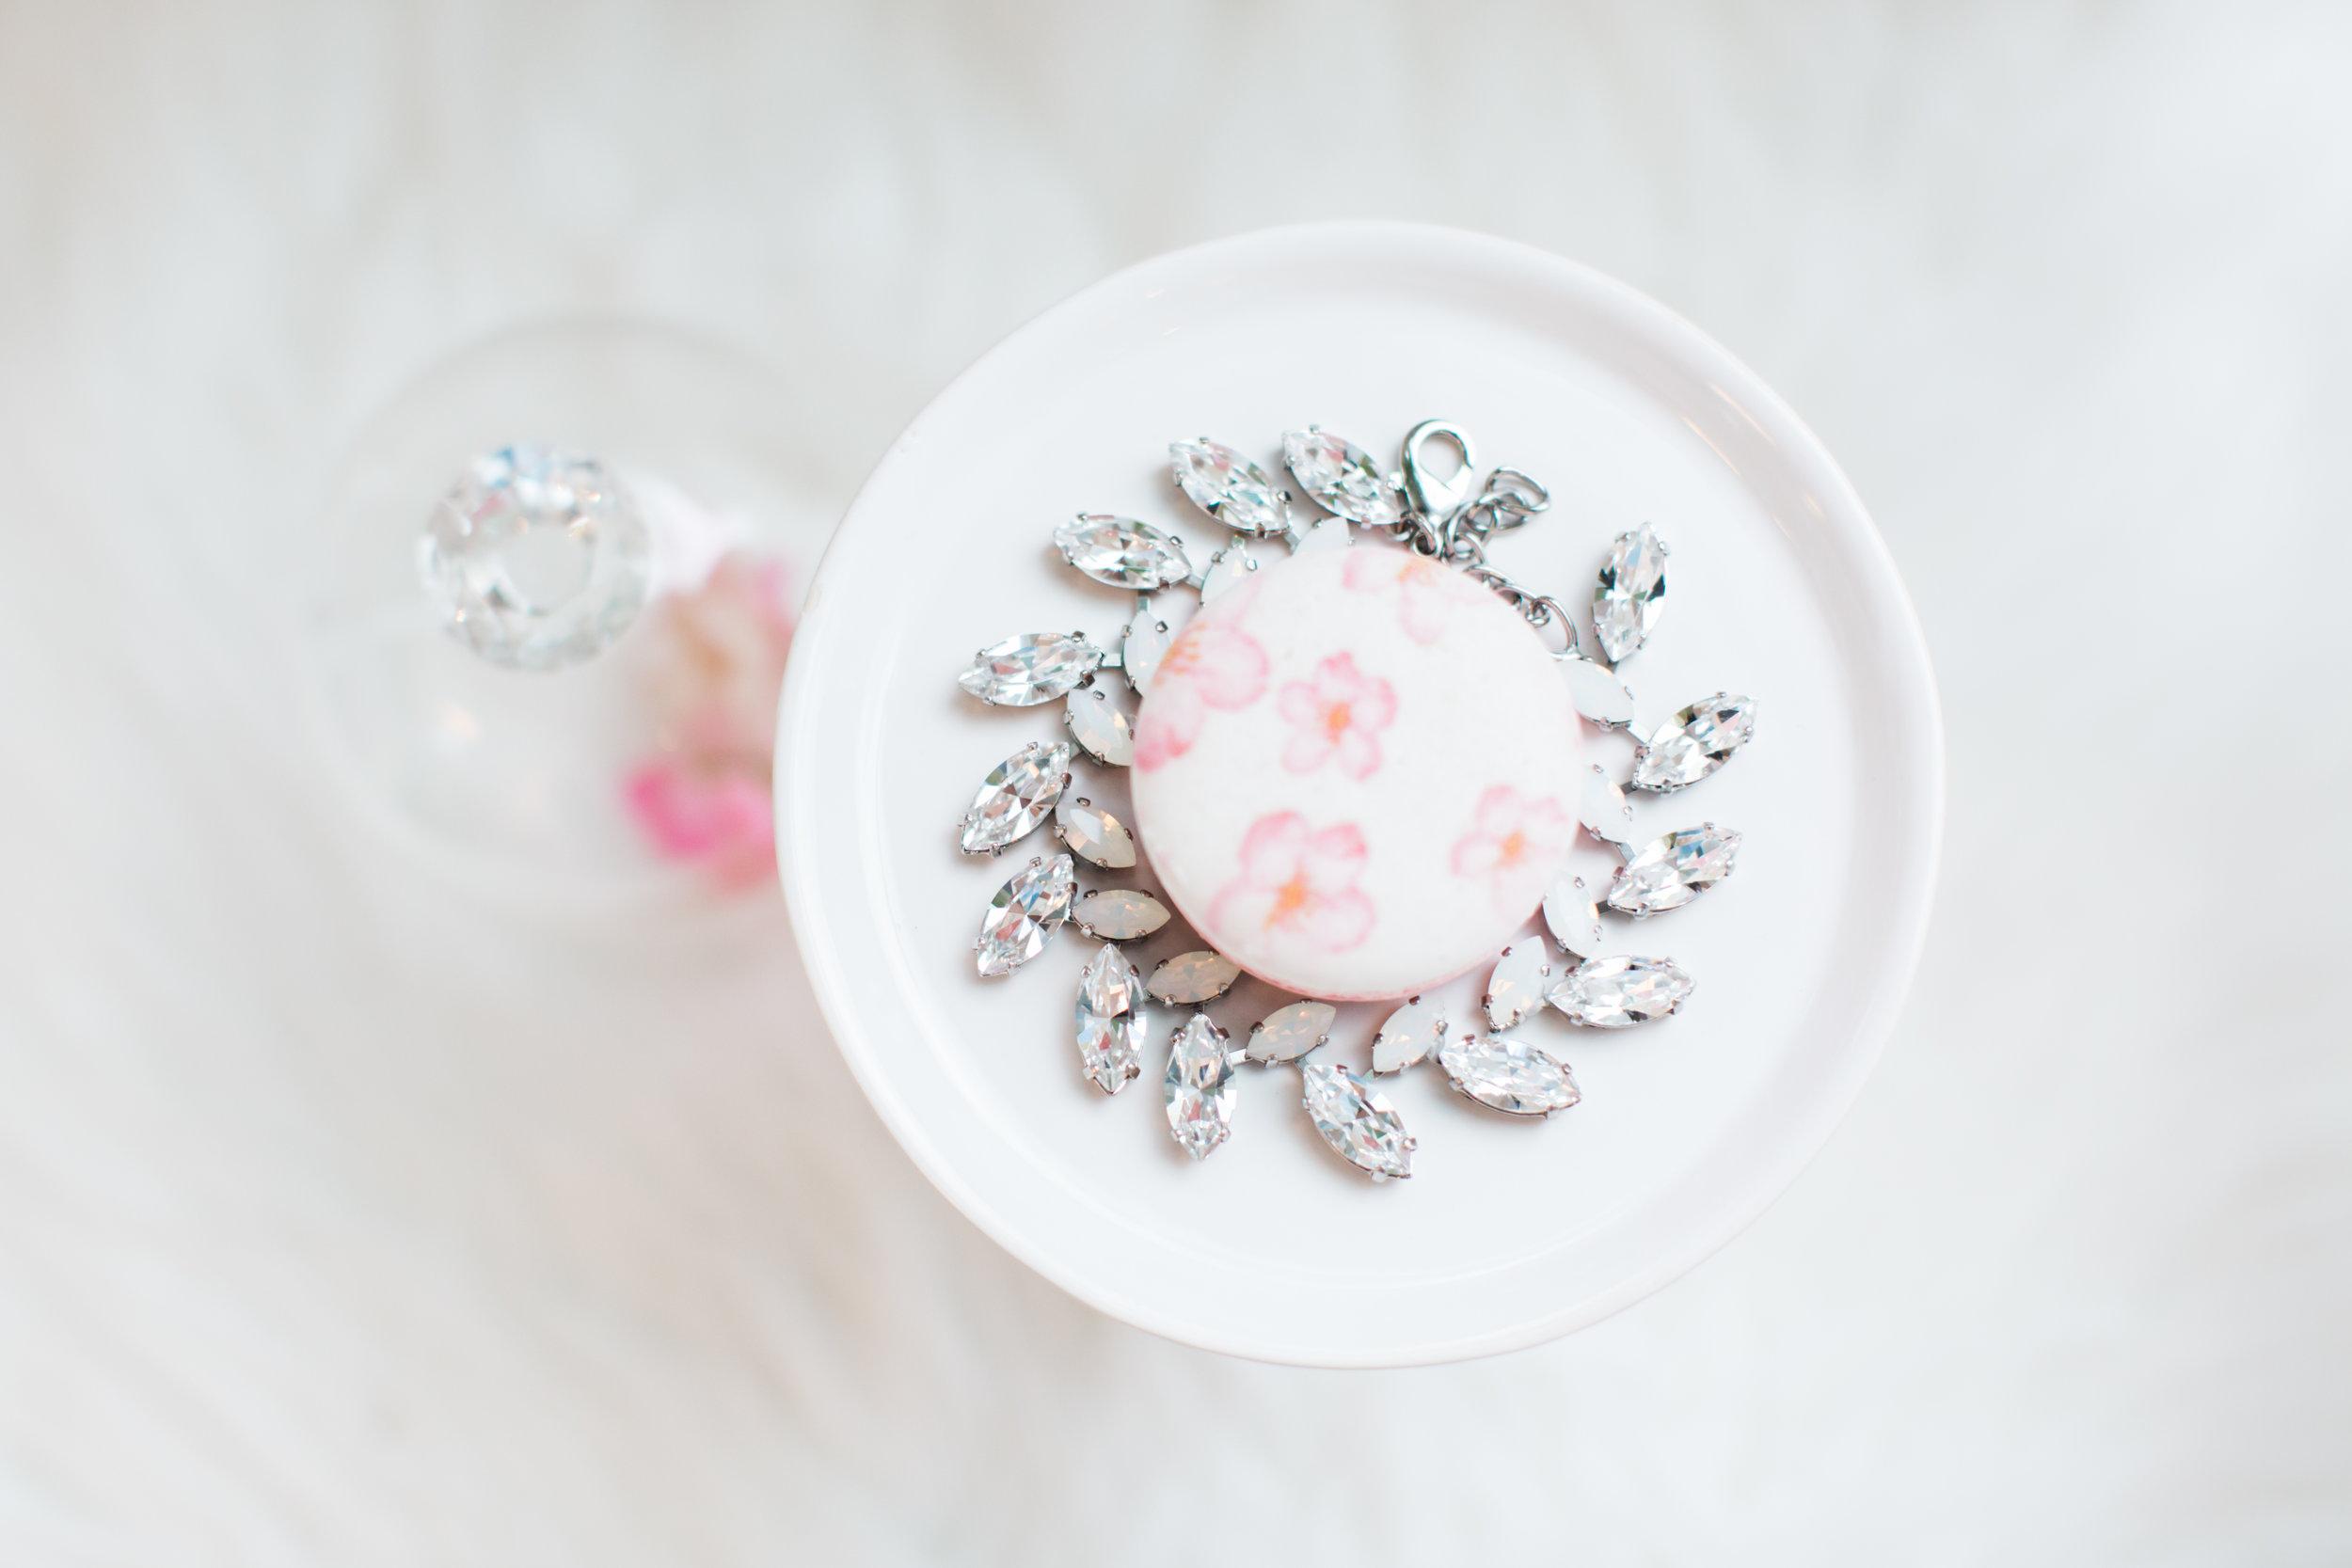 Cherry Blossom Inspired Photo Shoot Vancouver, Denise Lin, Elsa Corsi